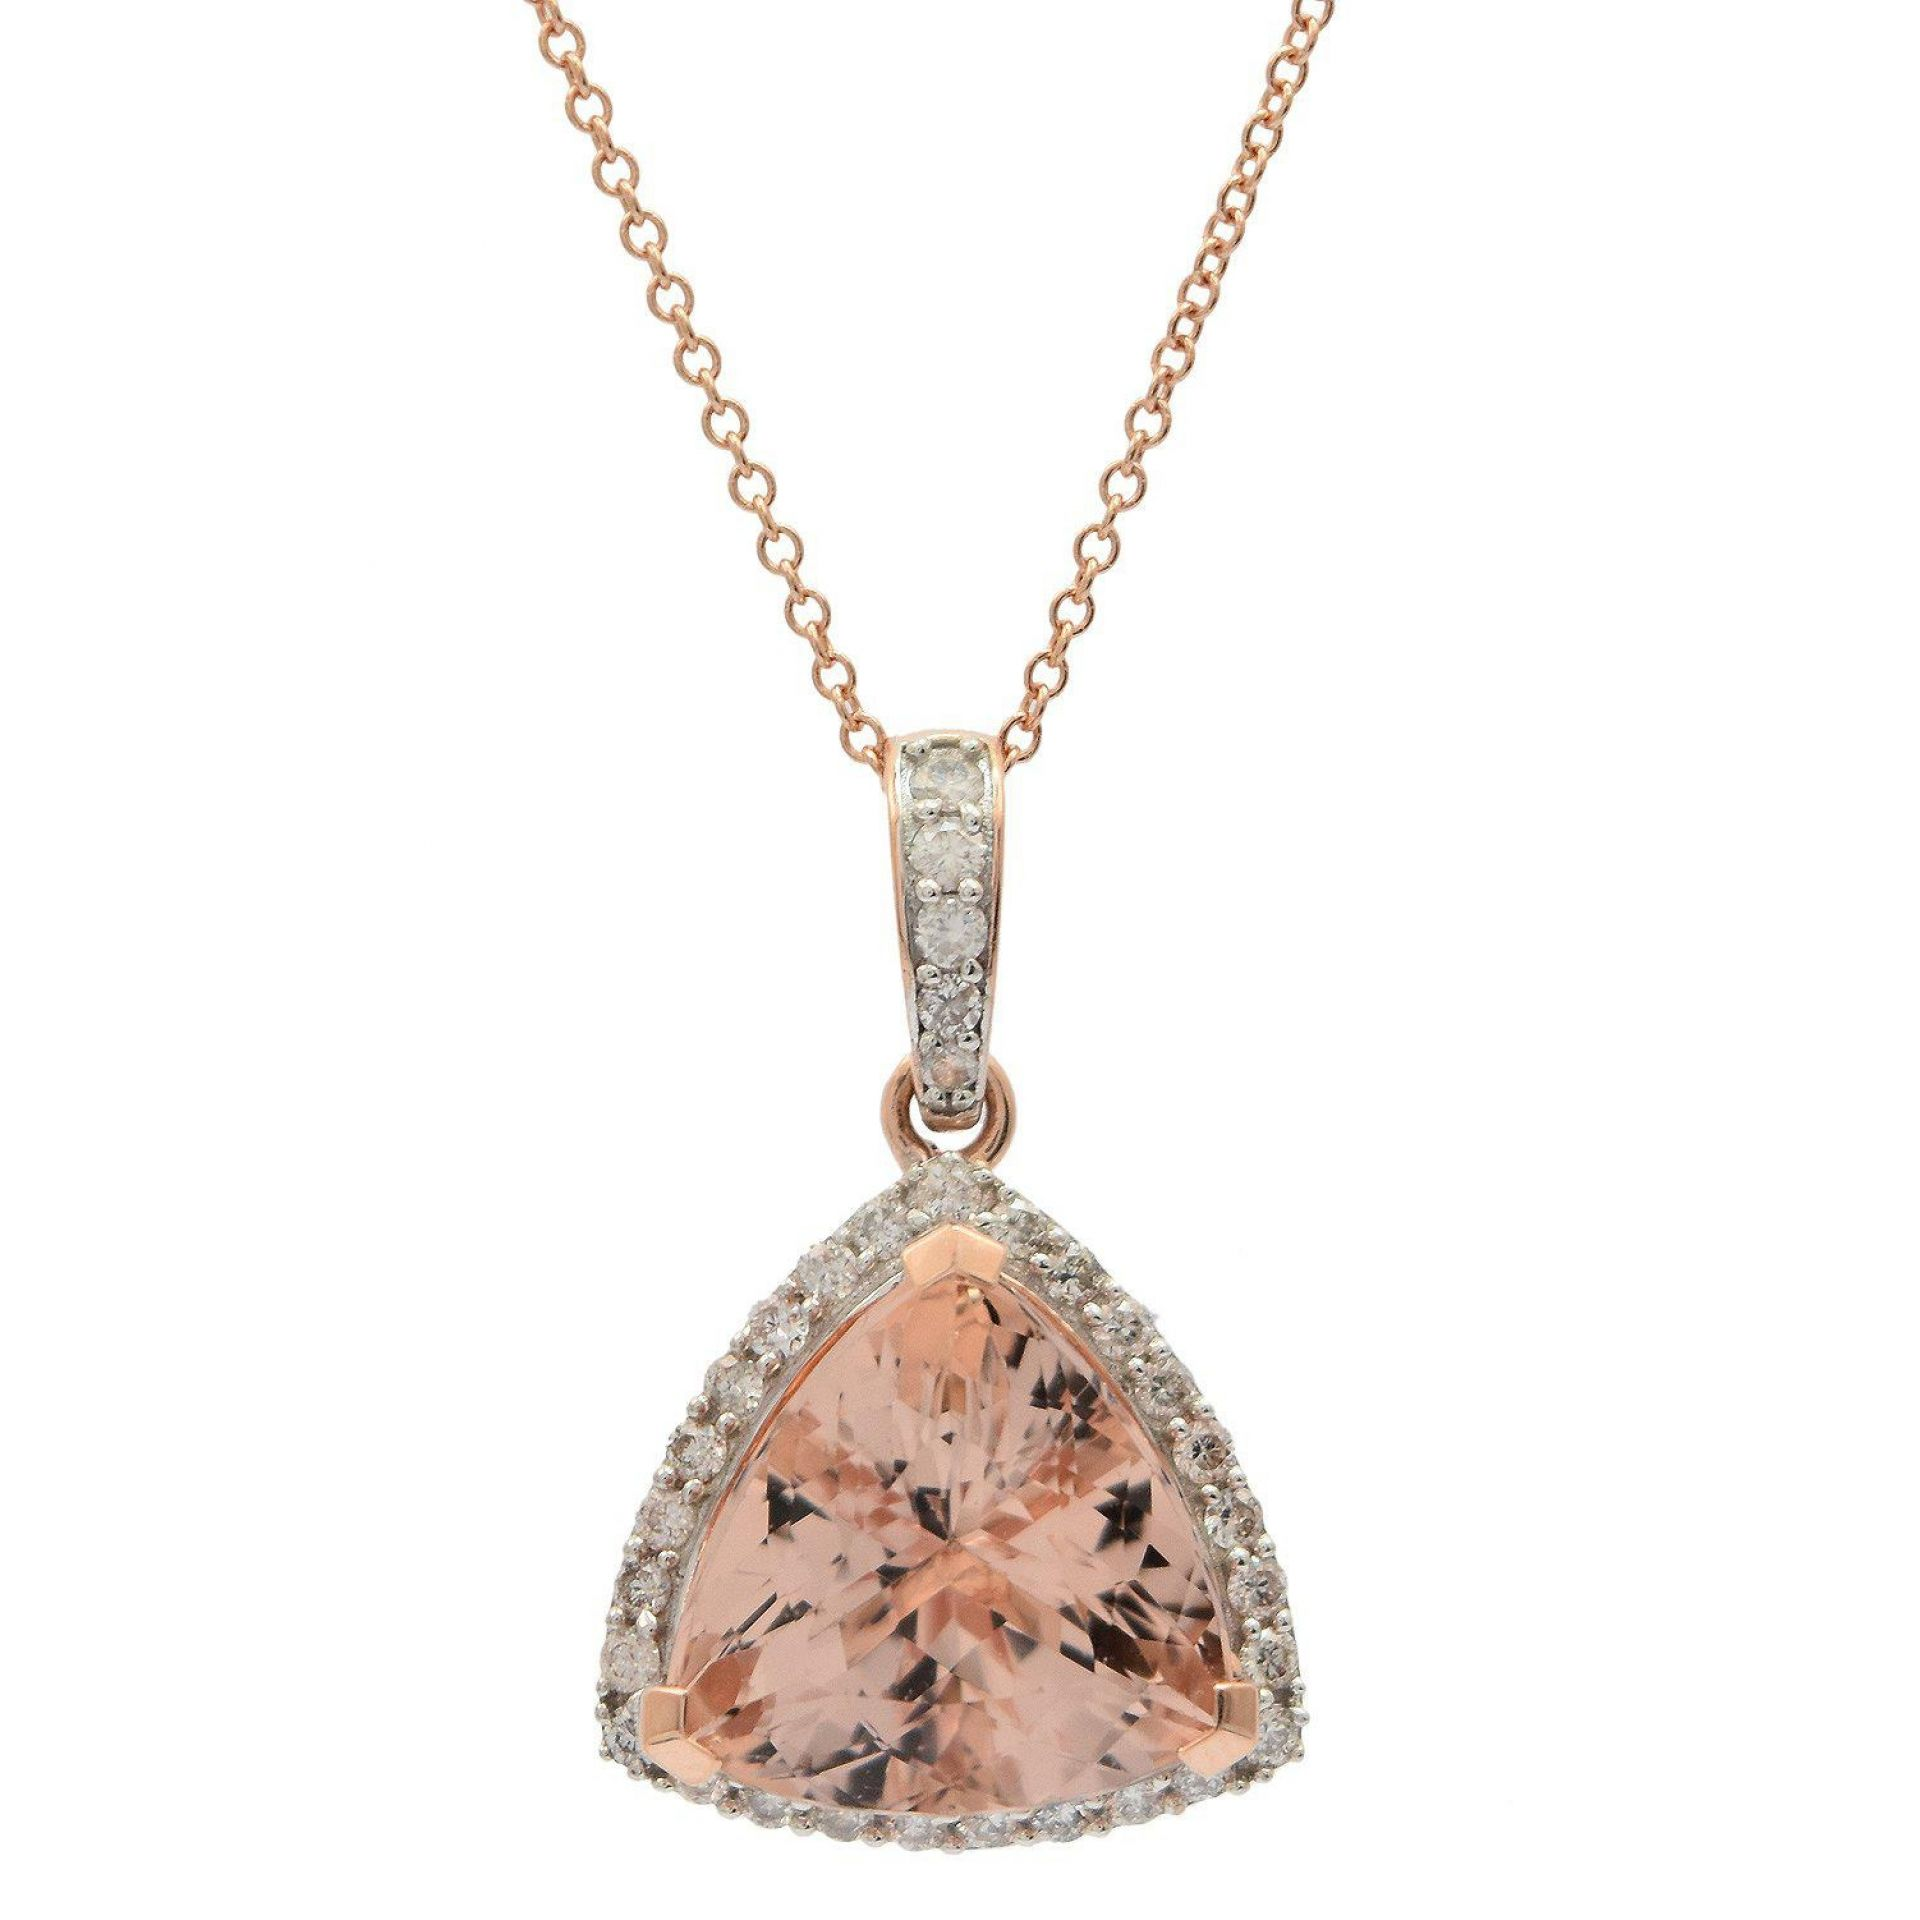 5.67ct Morganite and 0.38ctw Diamond Pendant/Necklace